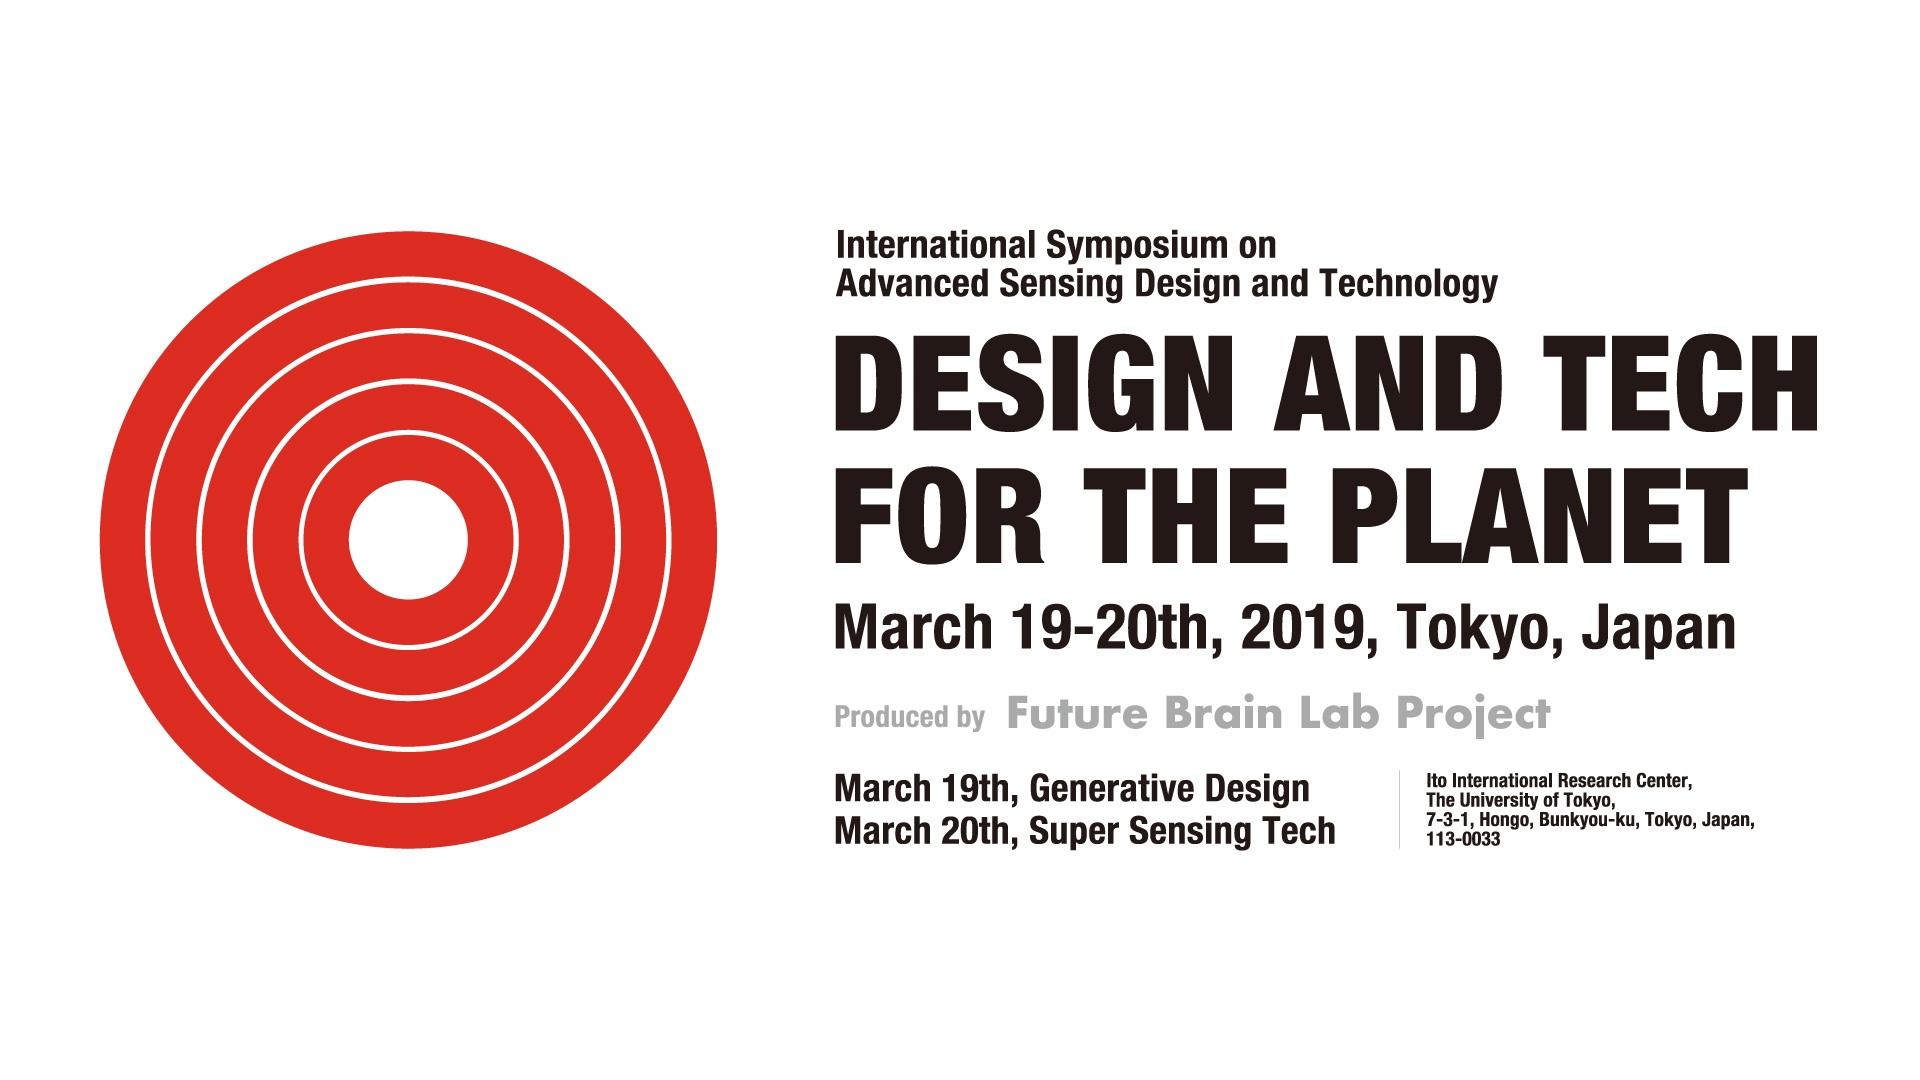 web-symposium-main-1.jpg